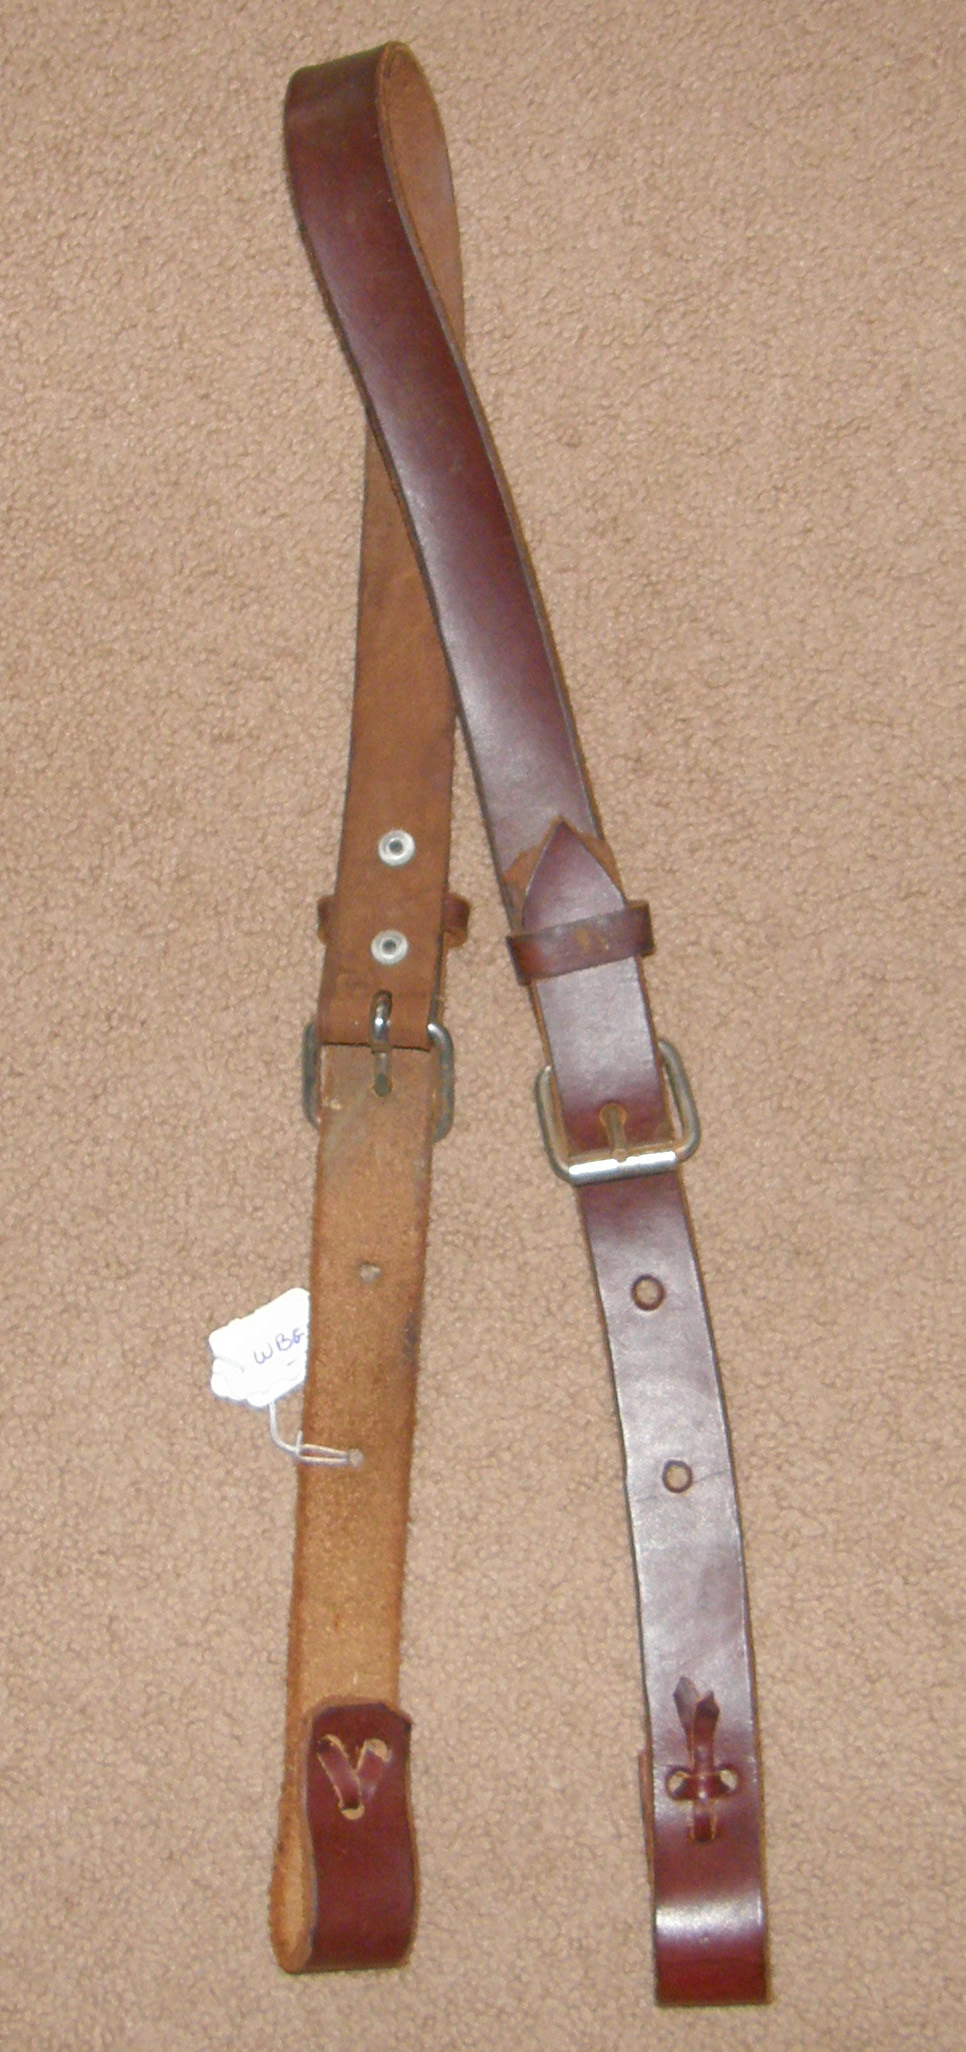 AceRugs Western Horse Saddle Back Cinch Flank Strap Rear Girth Leather Nutmeg Oil Billet Keeper